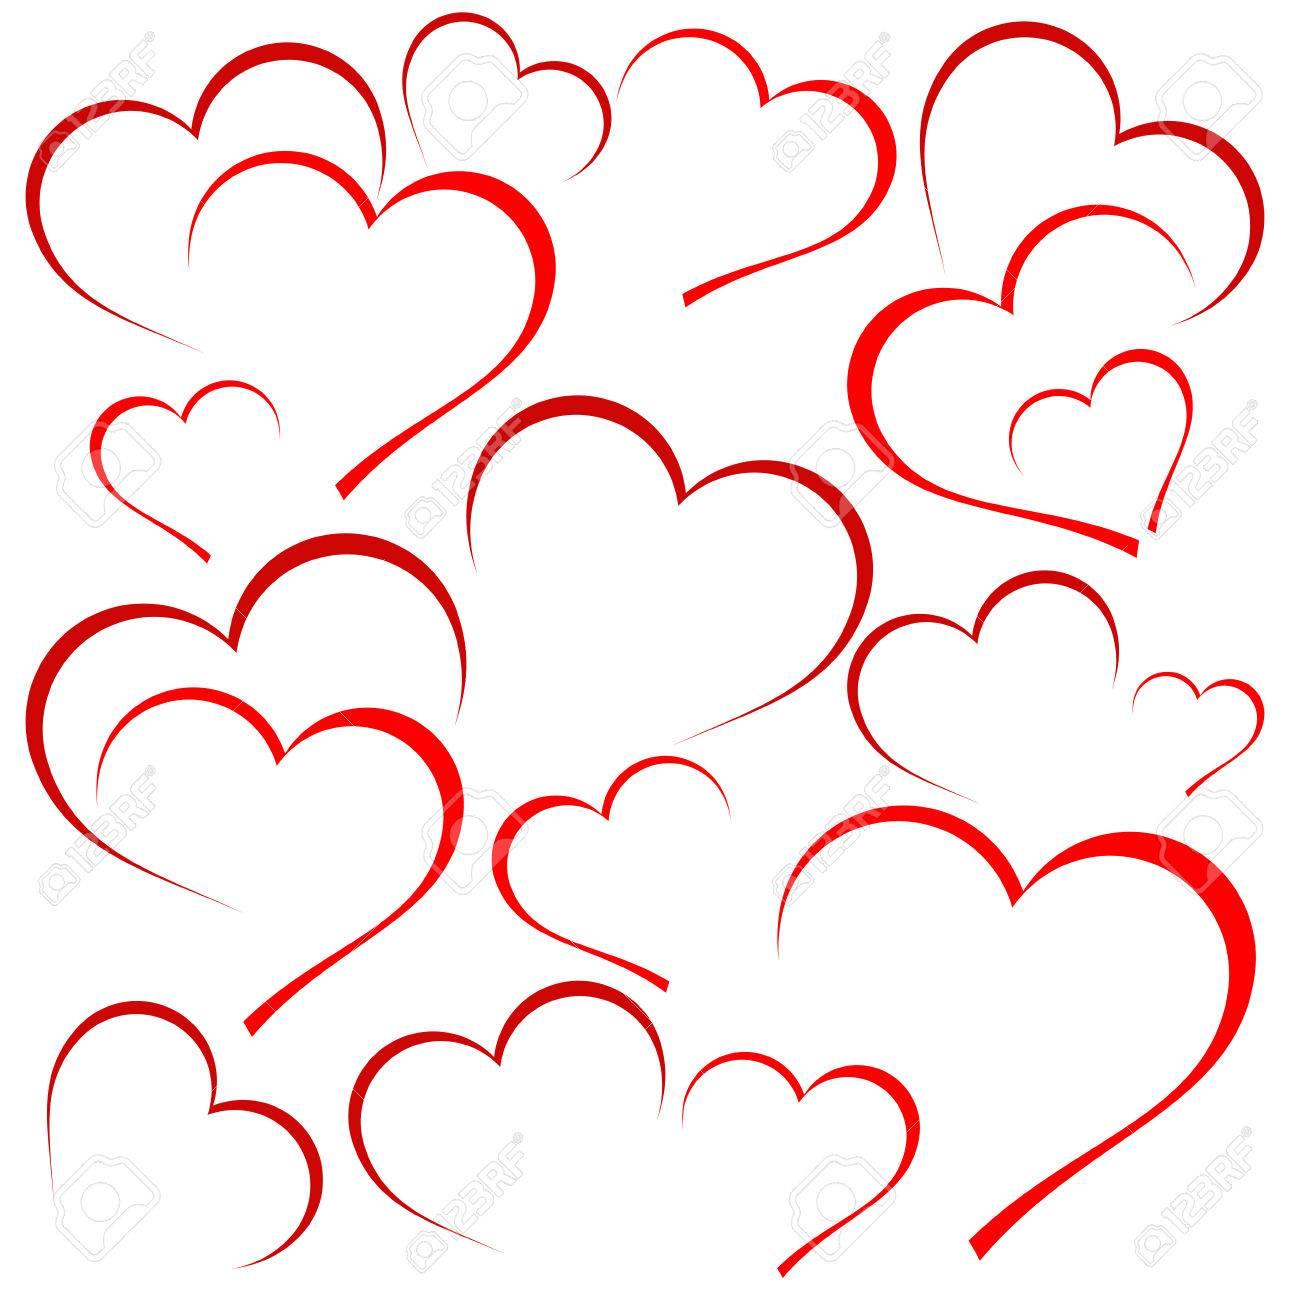 vector hearts background royalty free cliparts vectors and stock rh 123rf com vector hearts free vector heart ornament